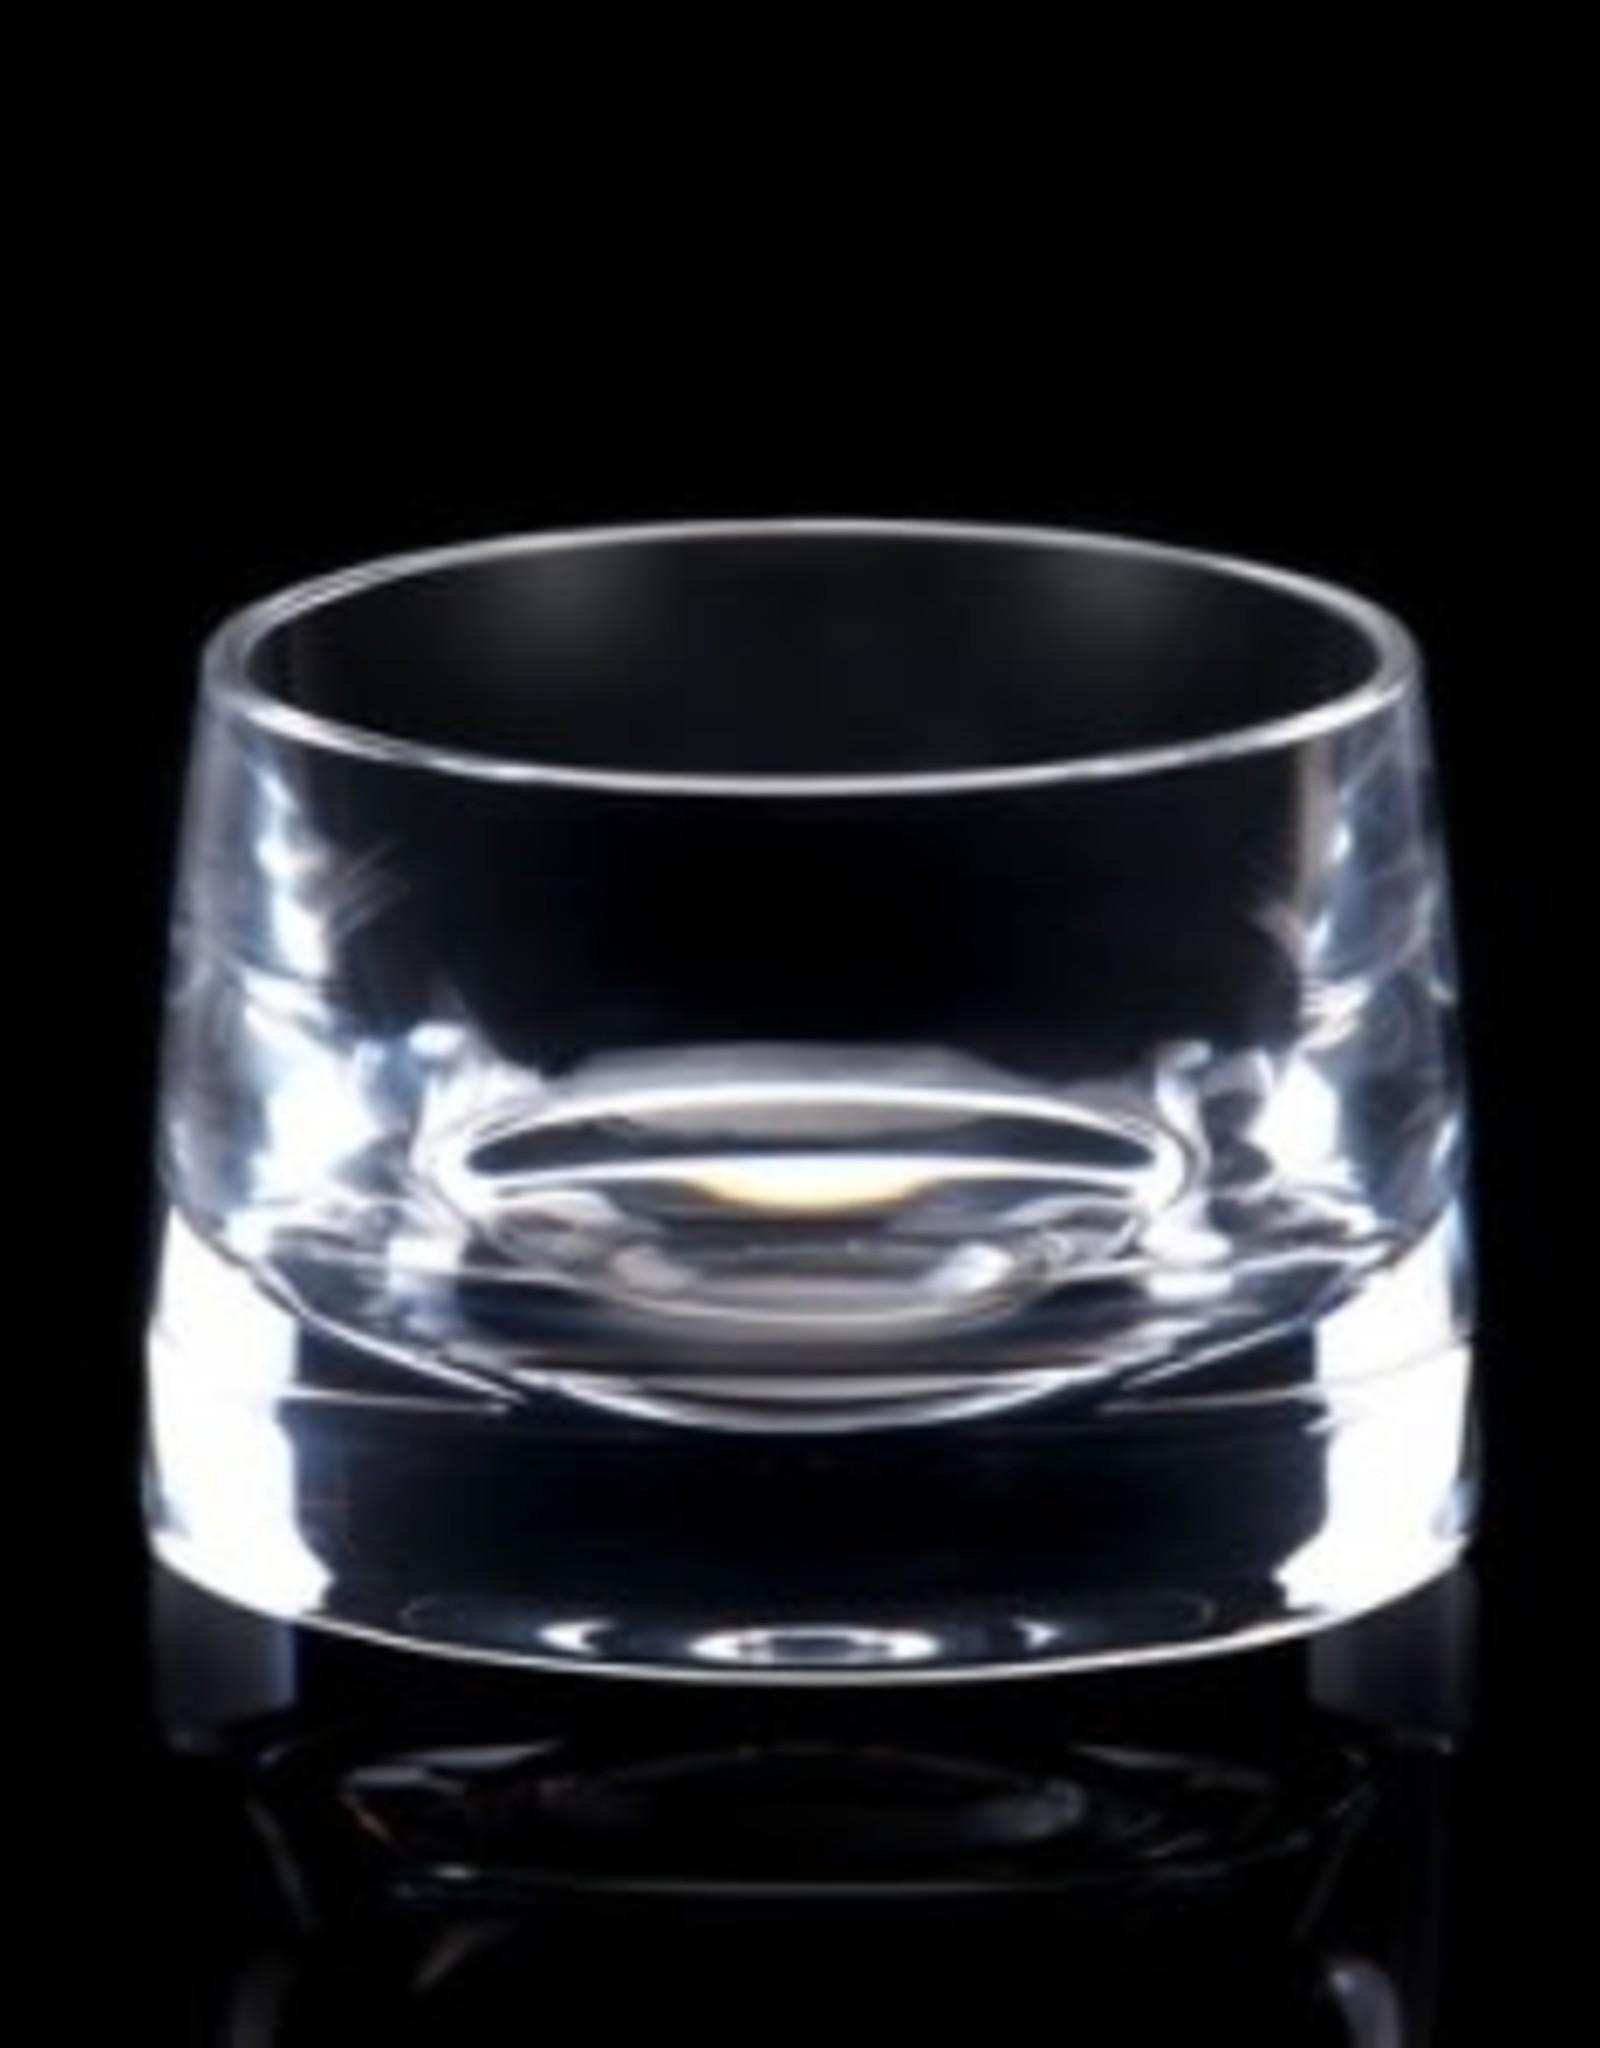 Optima Small Bowl - Clear